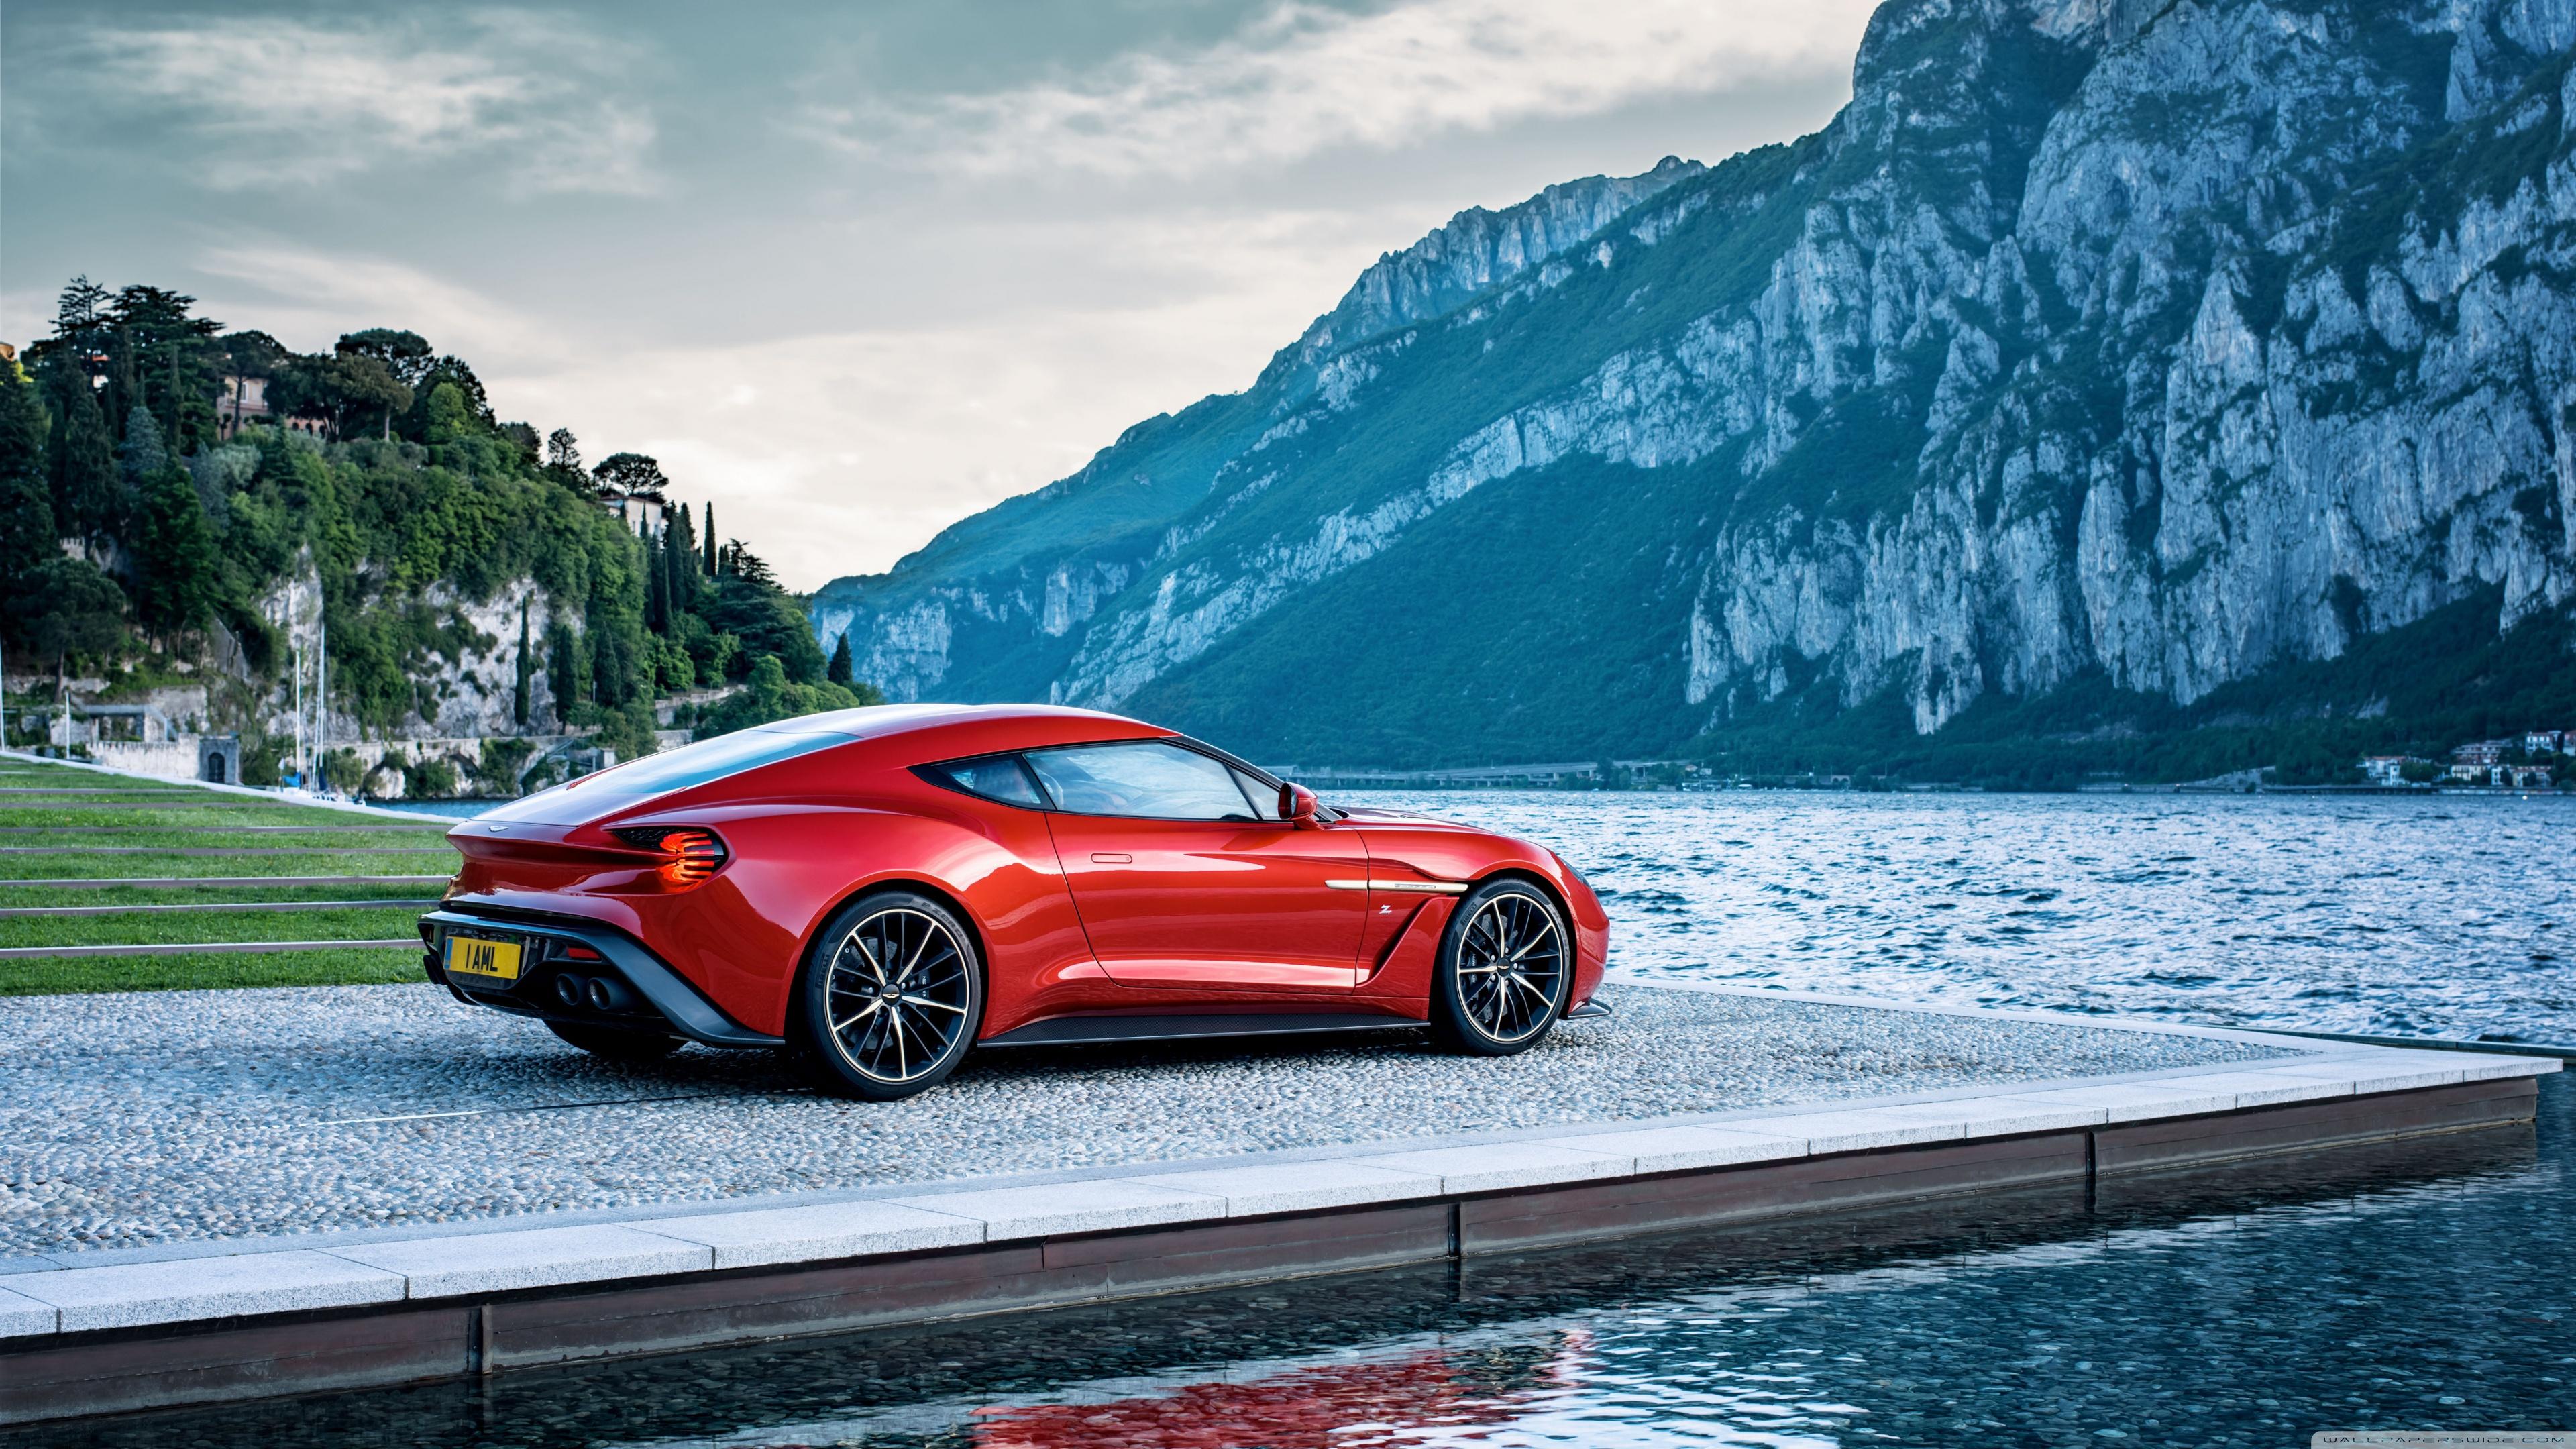 Free Download Red Aston Martin Sports Car 4k Hd Desktop Wallpaper